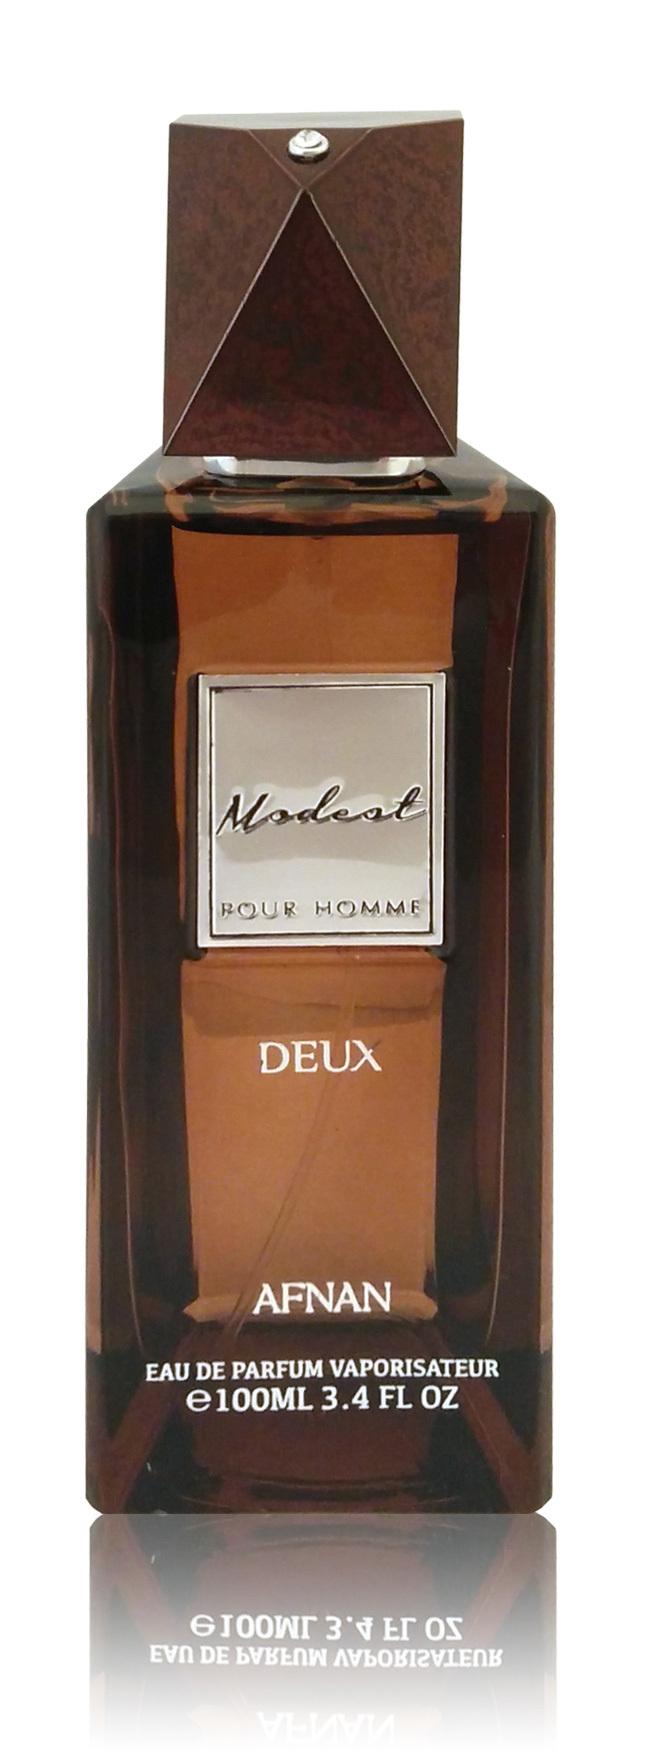 Modest Pour Homme Deux  m EDP 100 ML спрей от Афнан Парфюм Afnan Perfumes